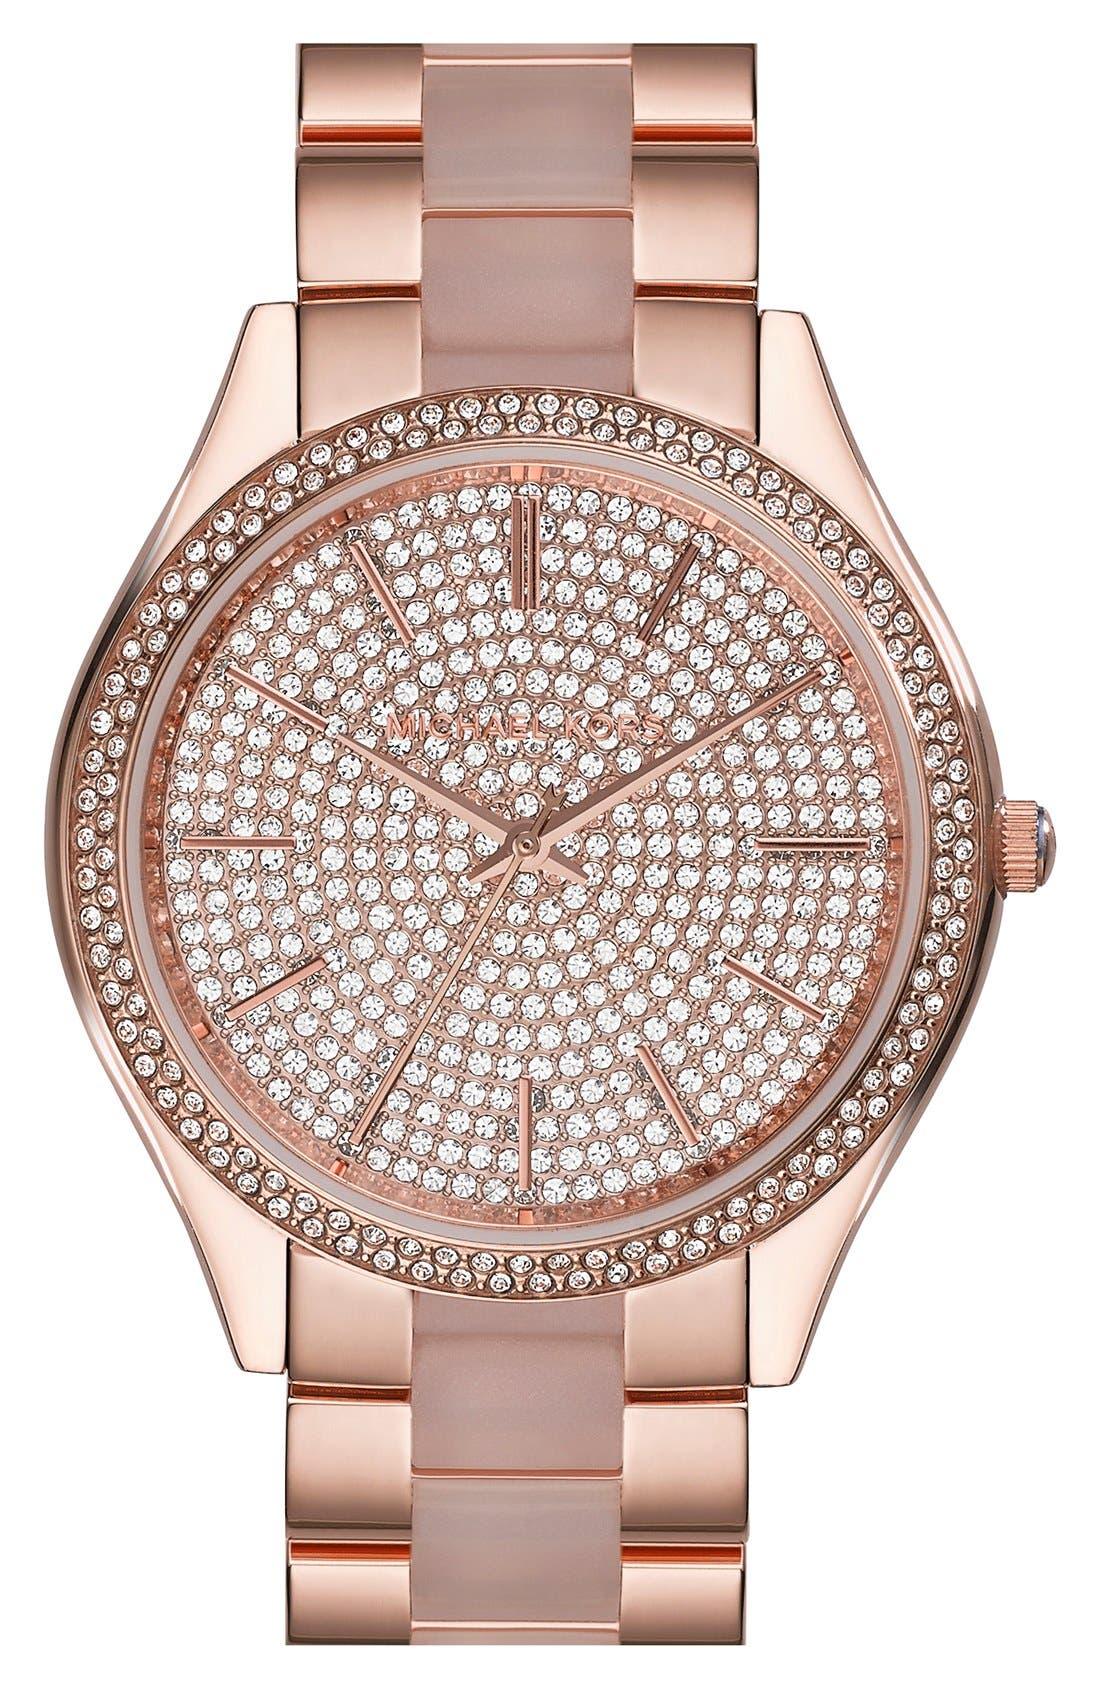 Alternate Image 1 Selected - Michael Kors 'Slim Runway' Pavé Dial Blush Acetate Link Bracelet Watch, 42mm